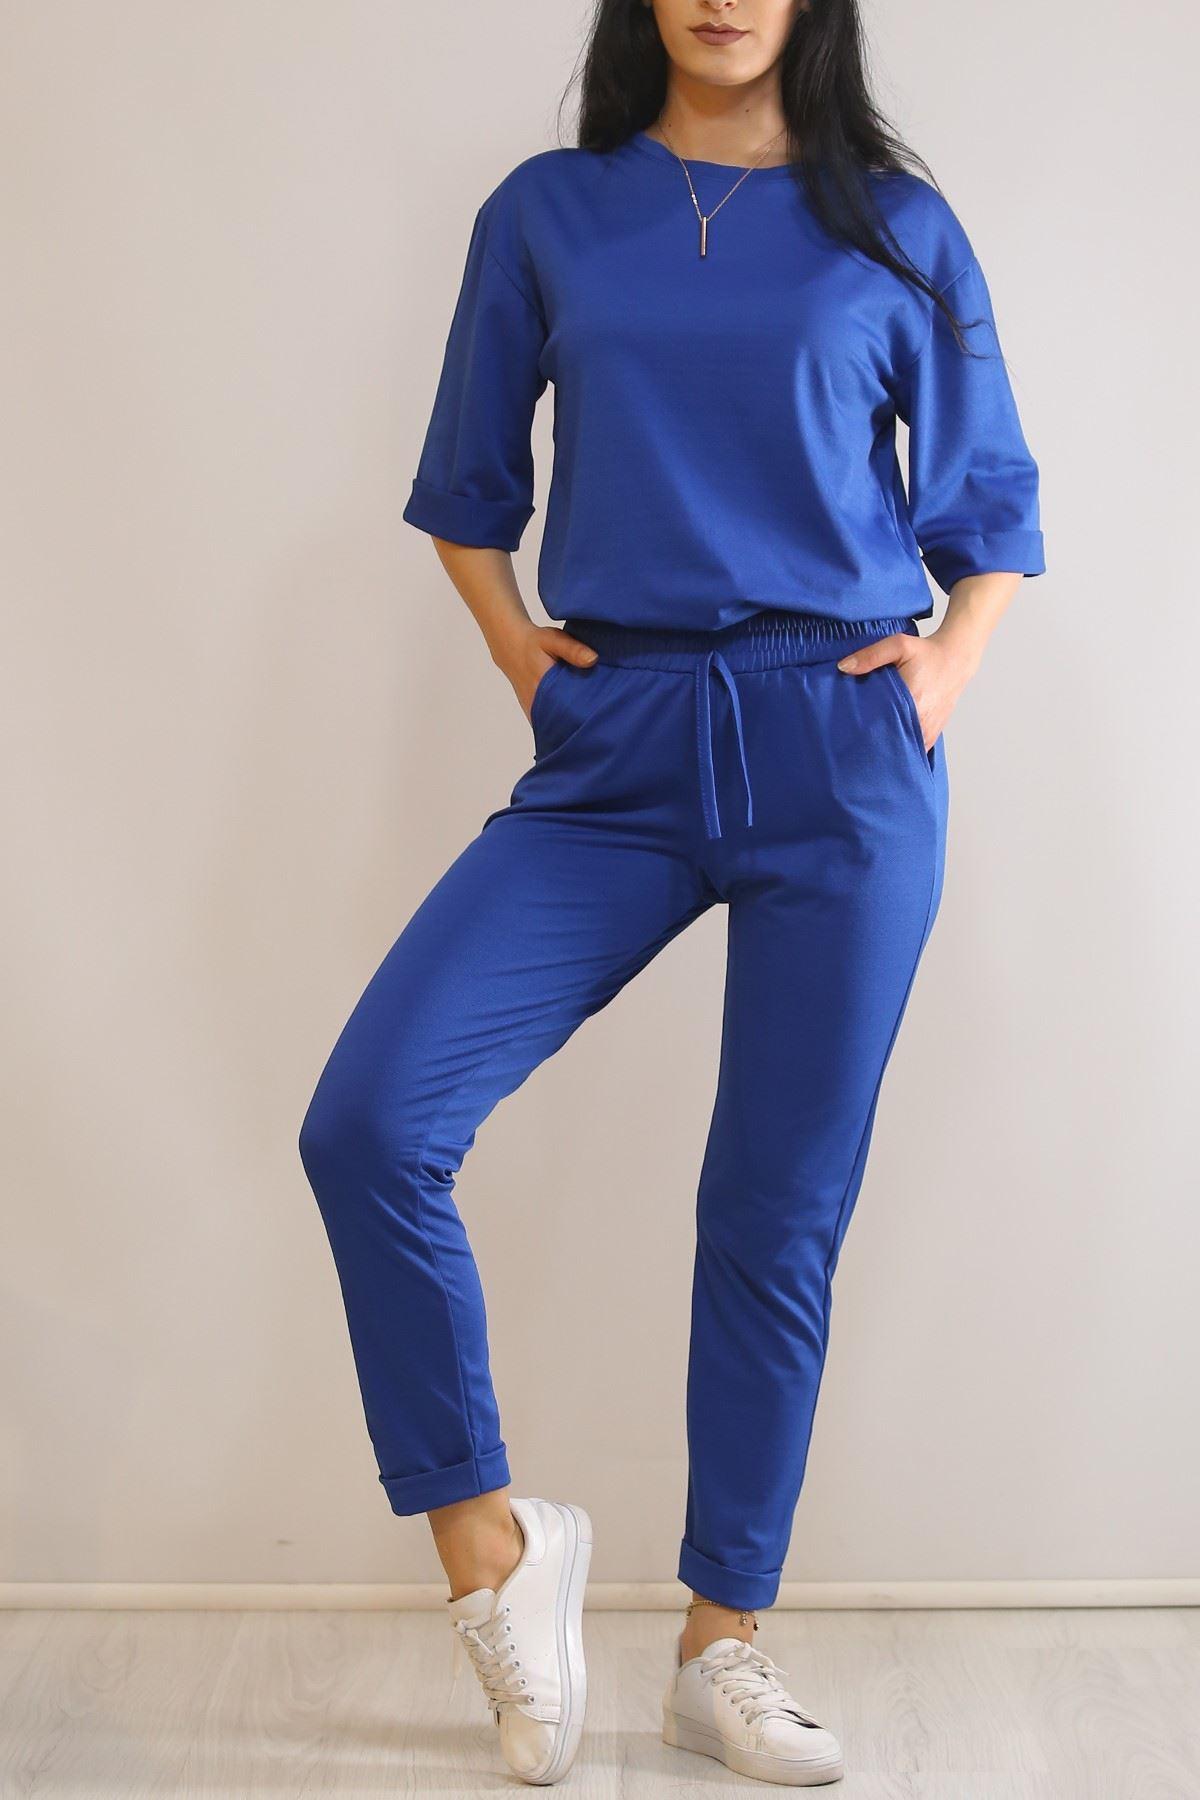 Duble Kol Takım Mavi - 5949.102.